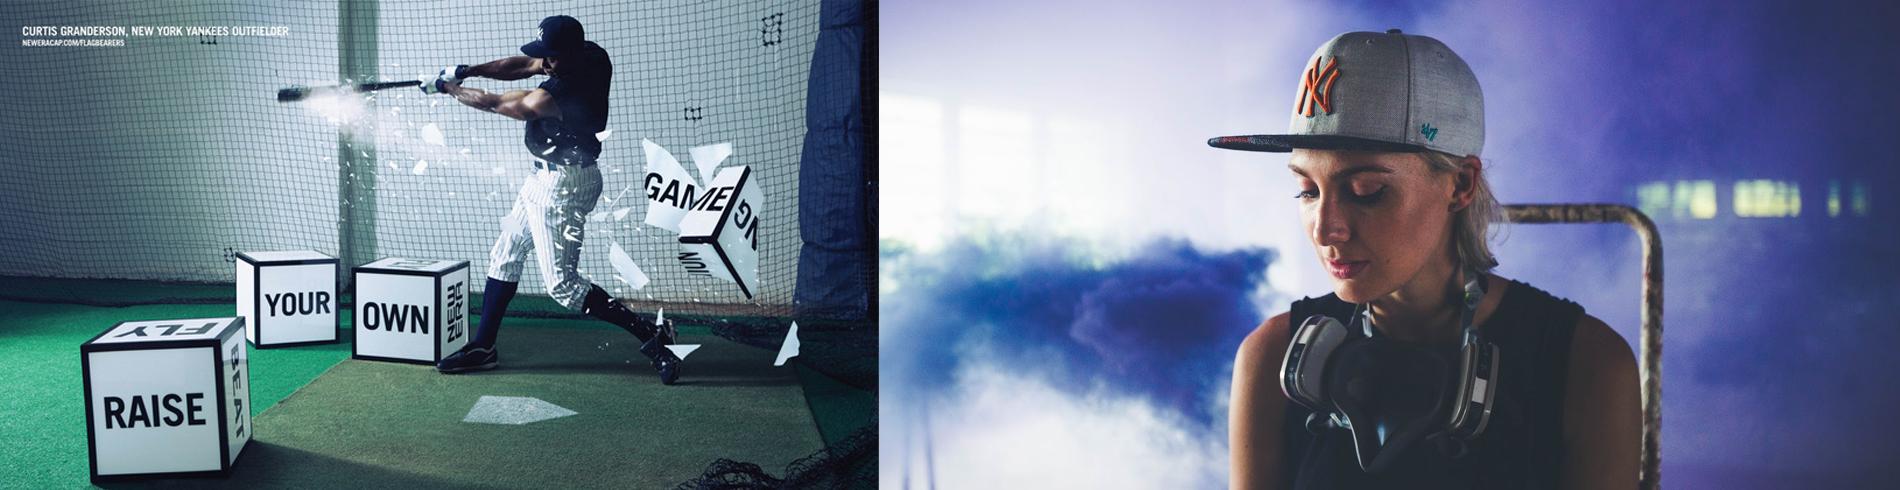 new-era-clothing-banner-2.jpg